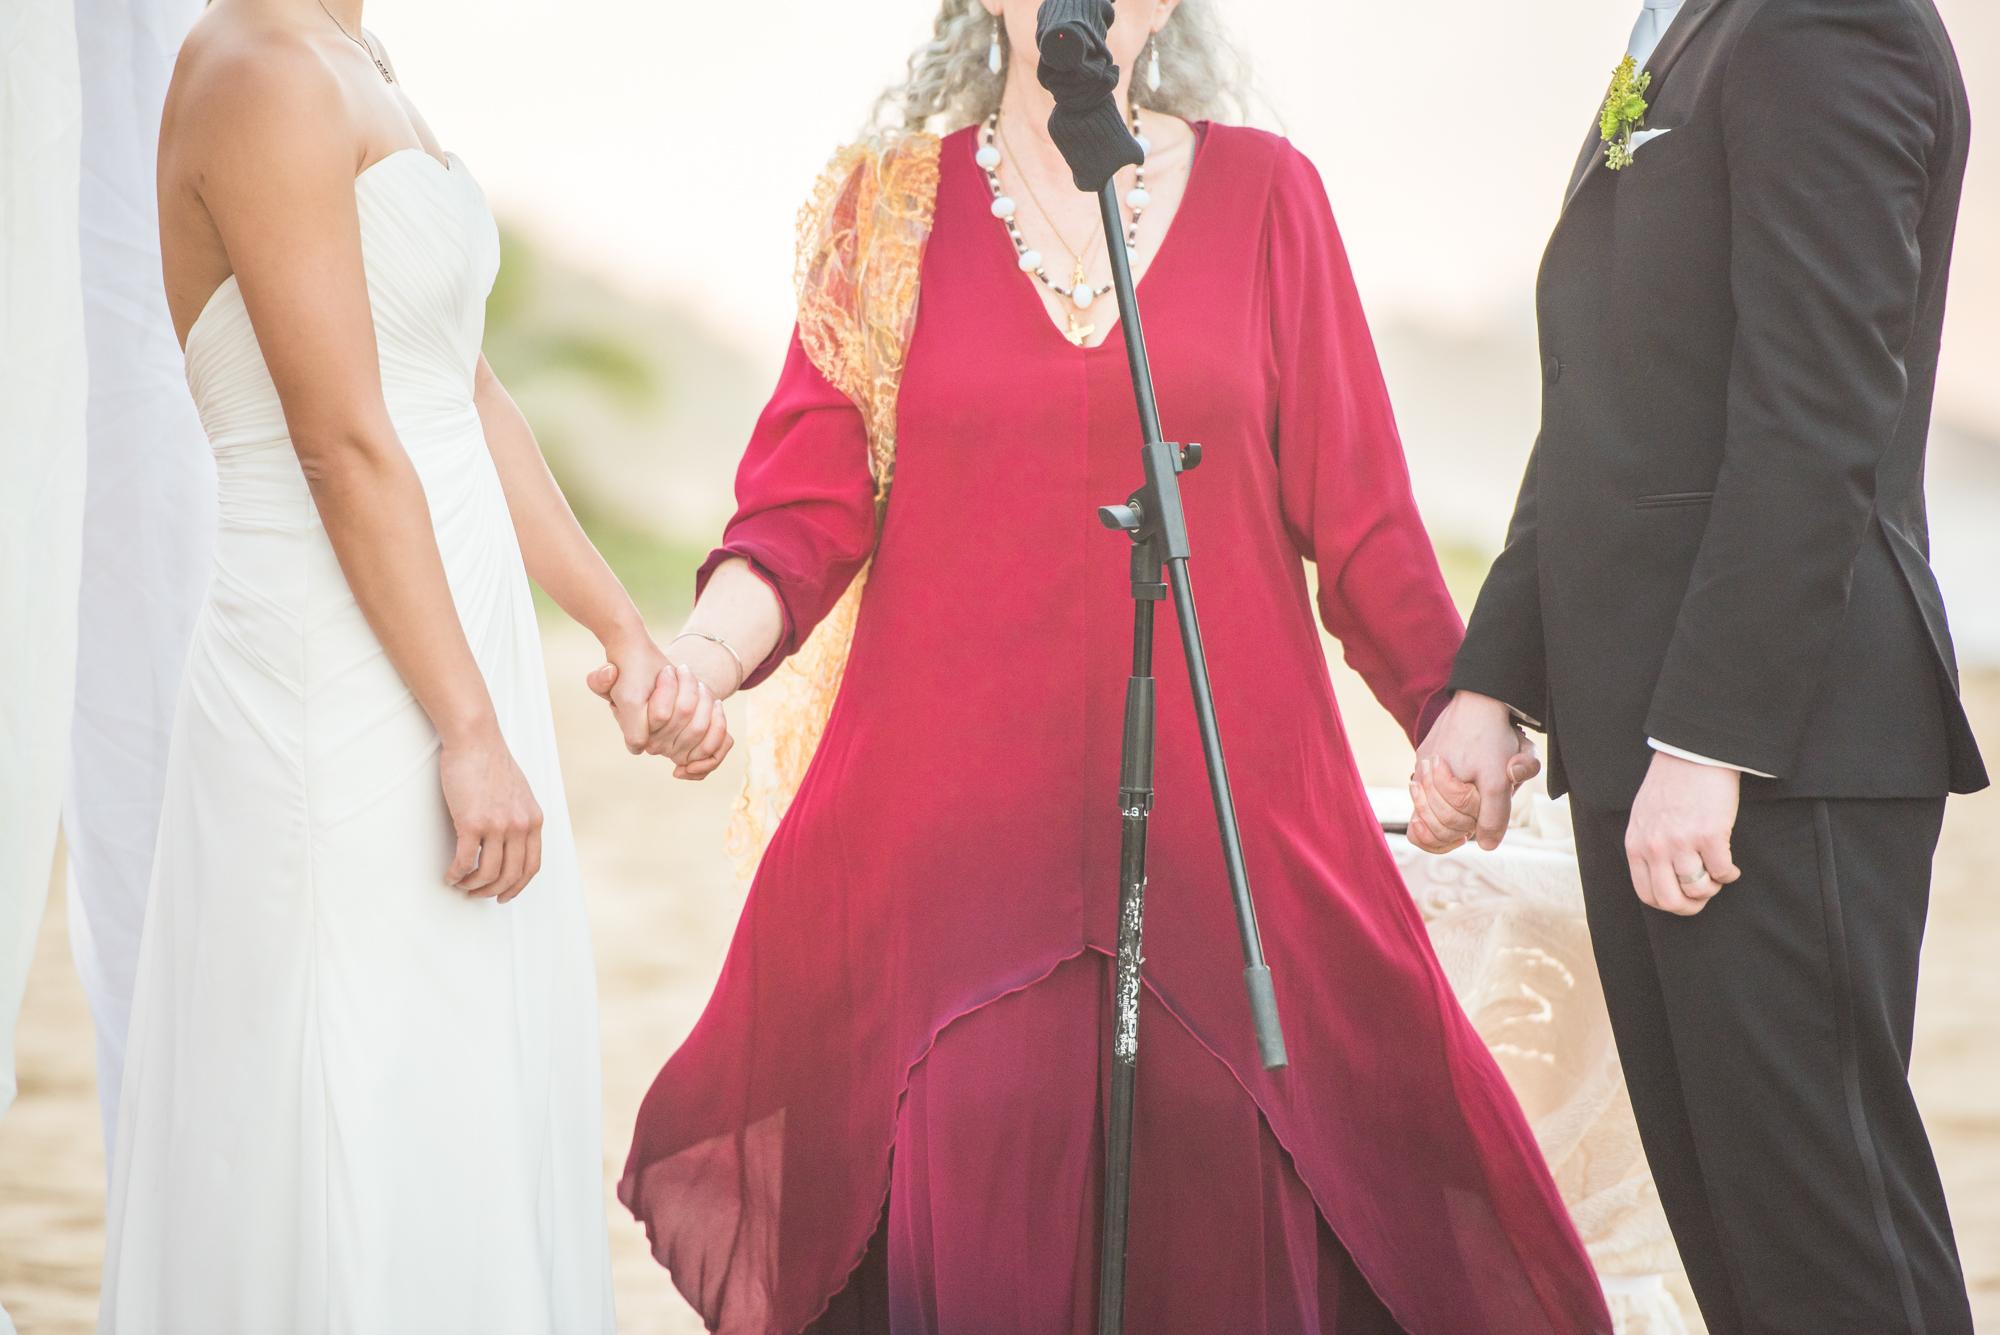 Yifan_Zhang_Geoff_Oberhofer_Carlin_Ma_wedding--44.jpg